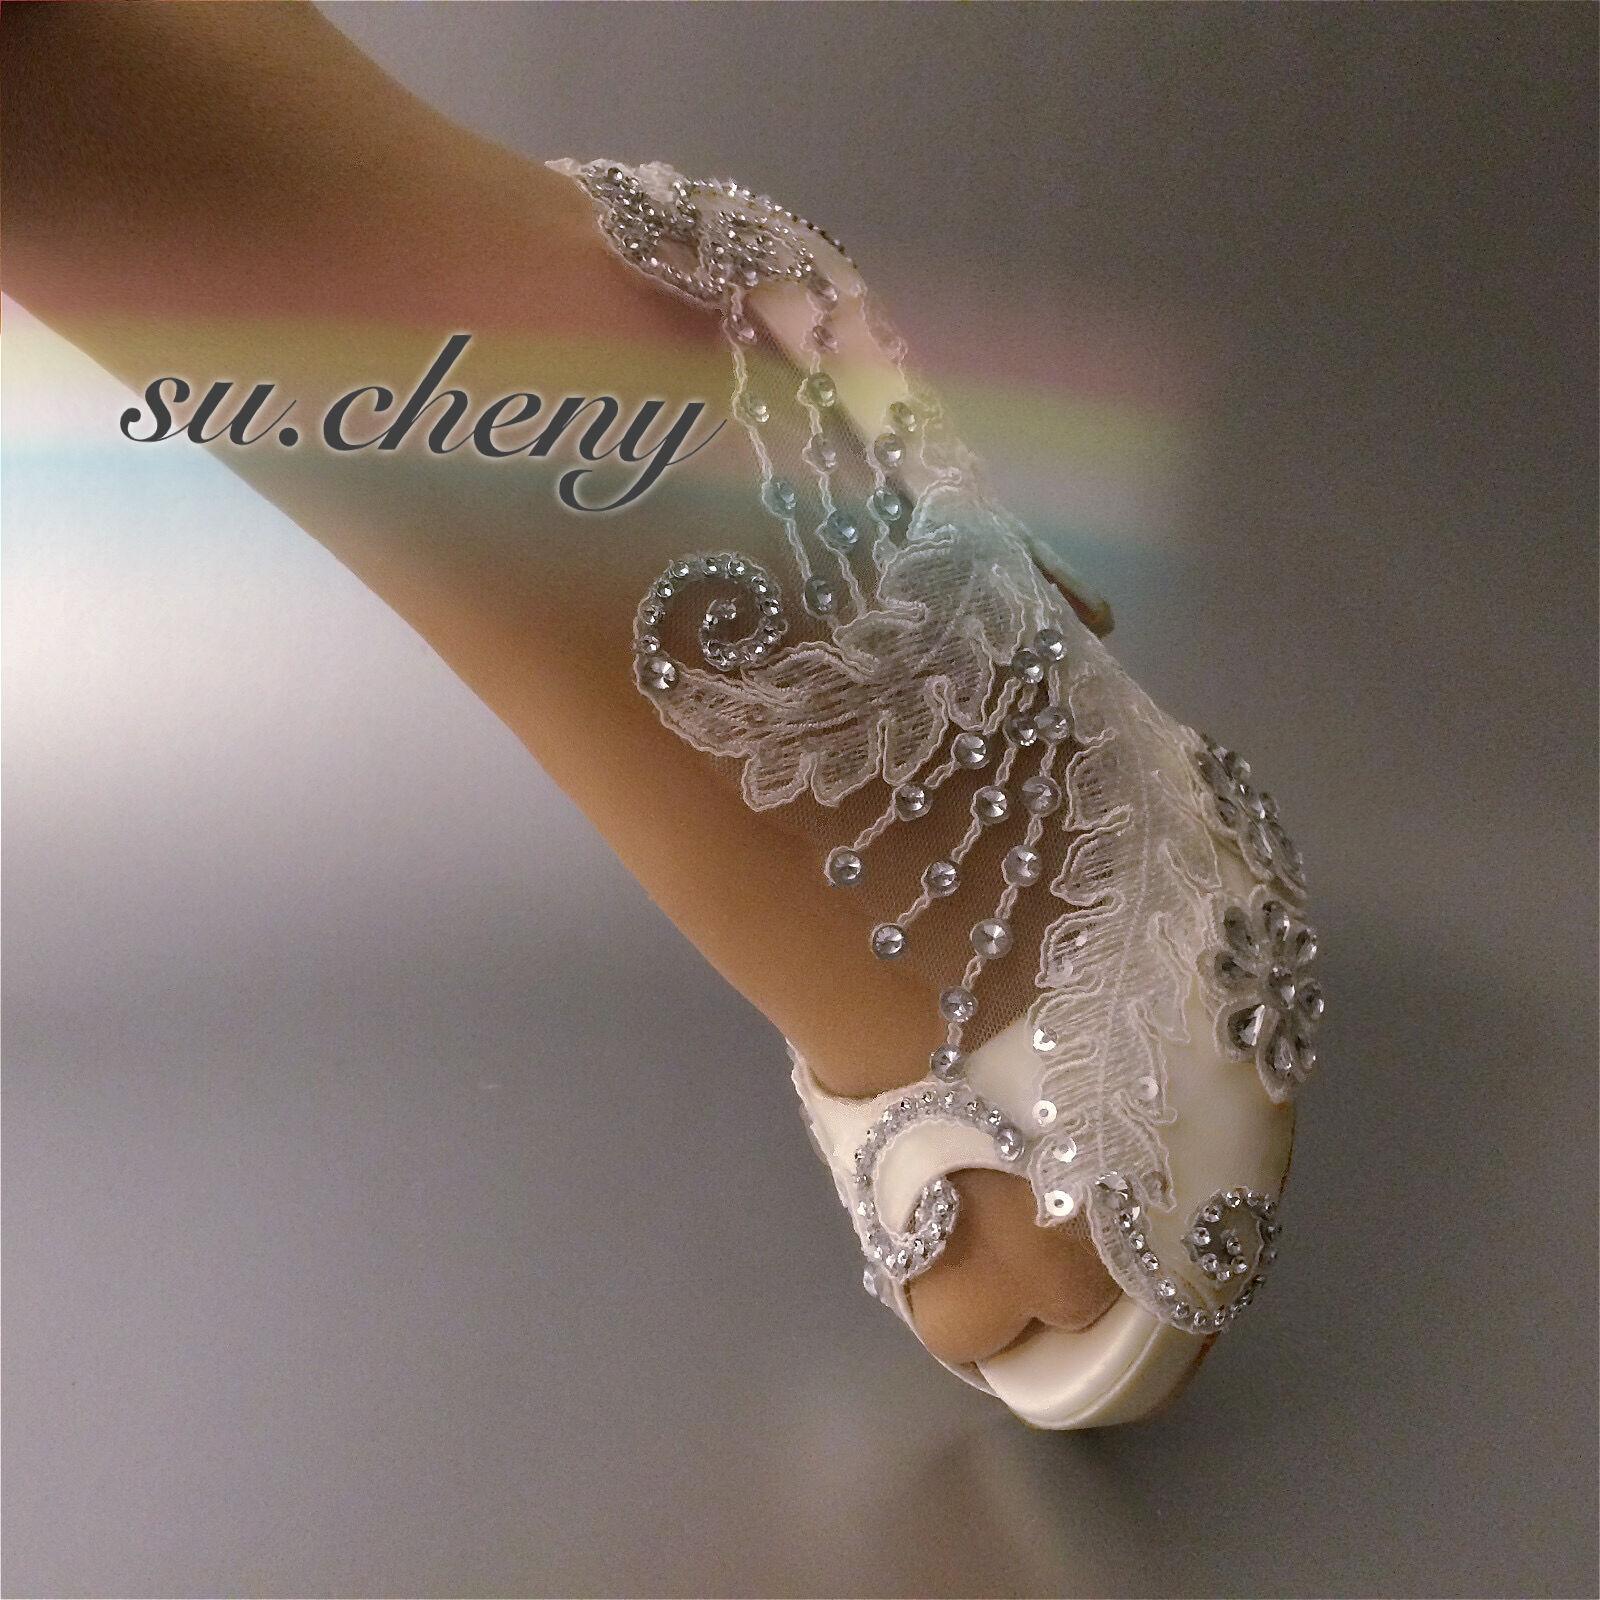 Su.cheny 3  4  heel satin white ivory lace crystal open toe Wedding bridal shoes